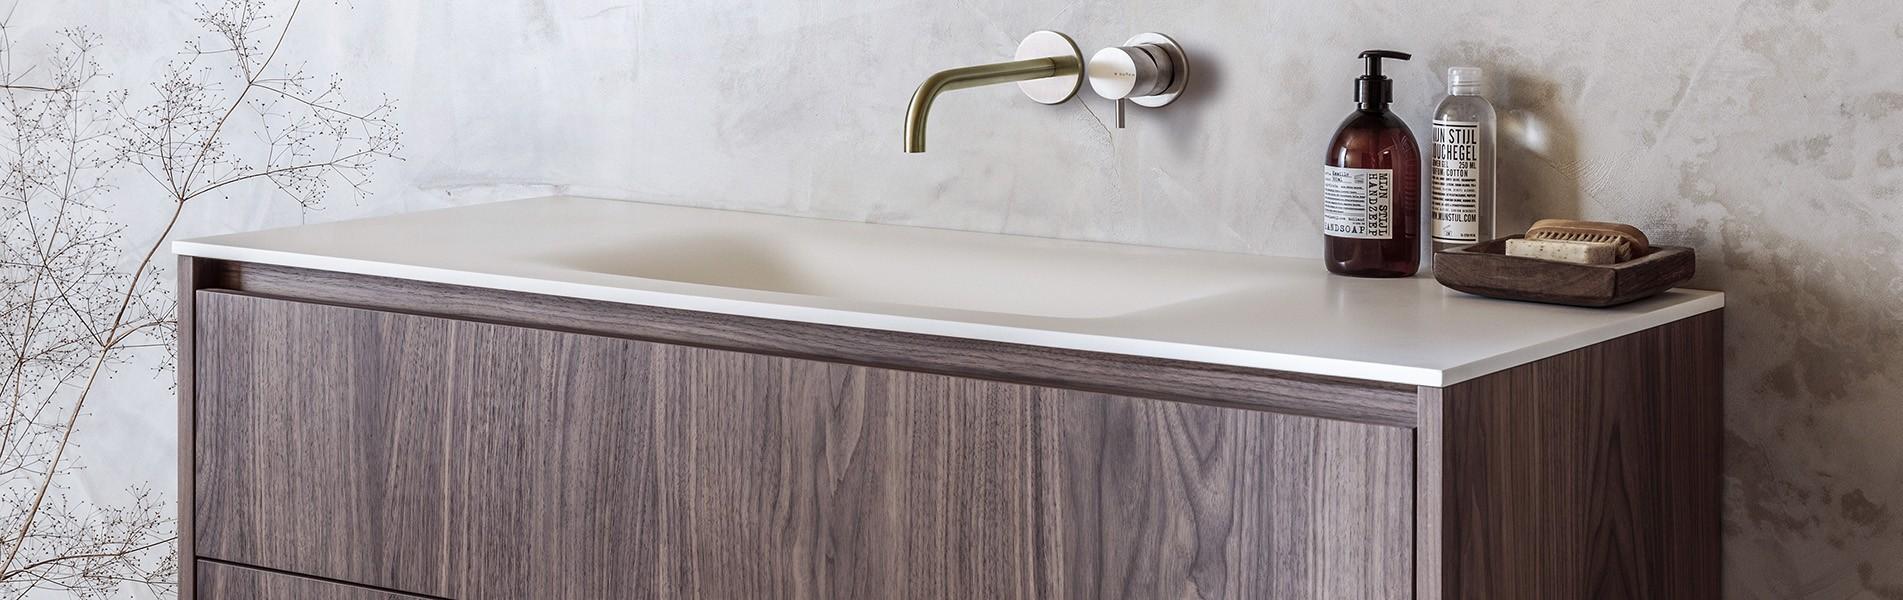 webshop b dutch design badkamermeubelen serie palermo ook